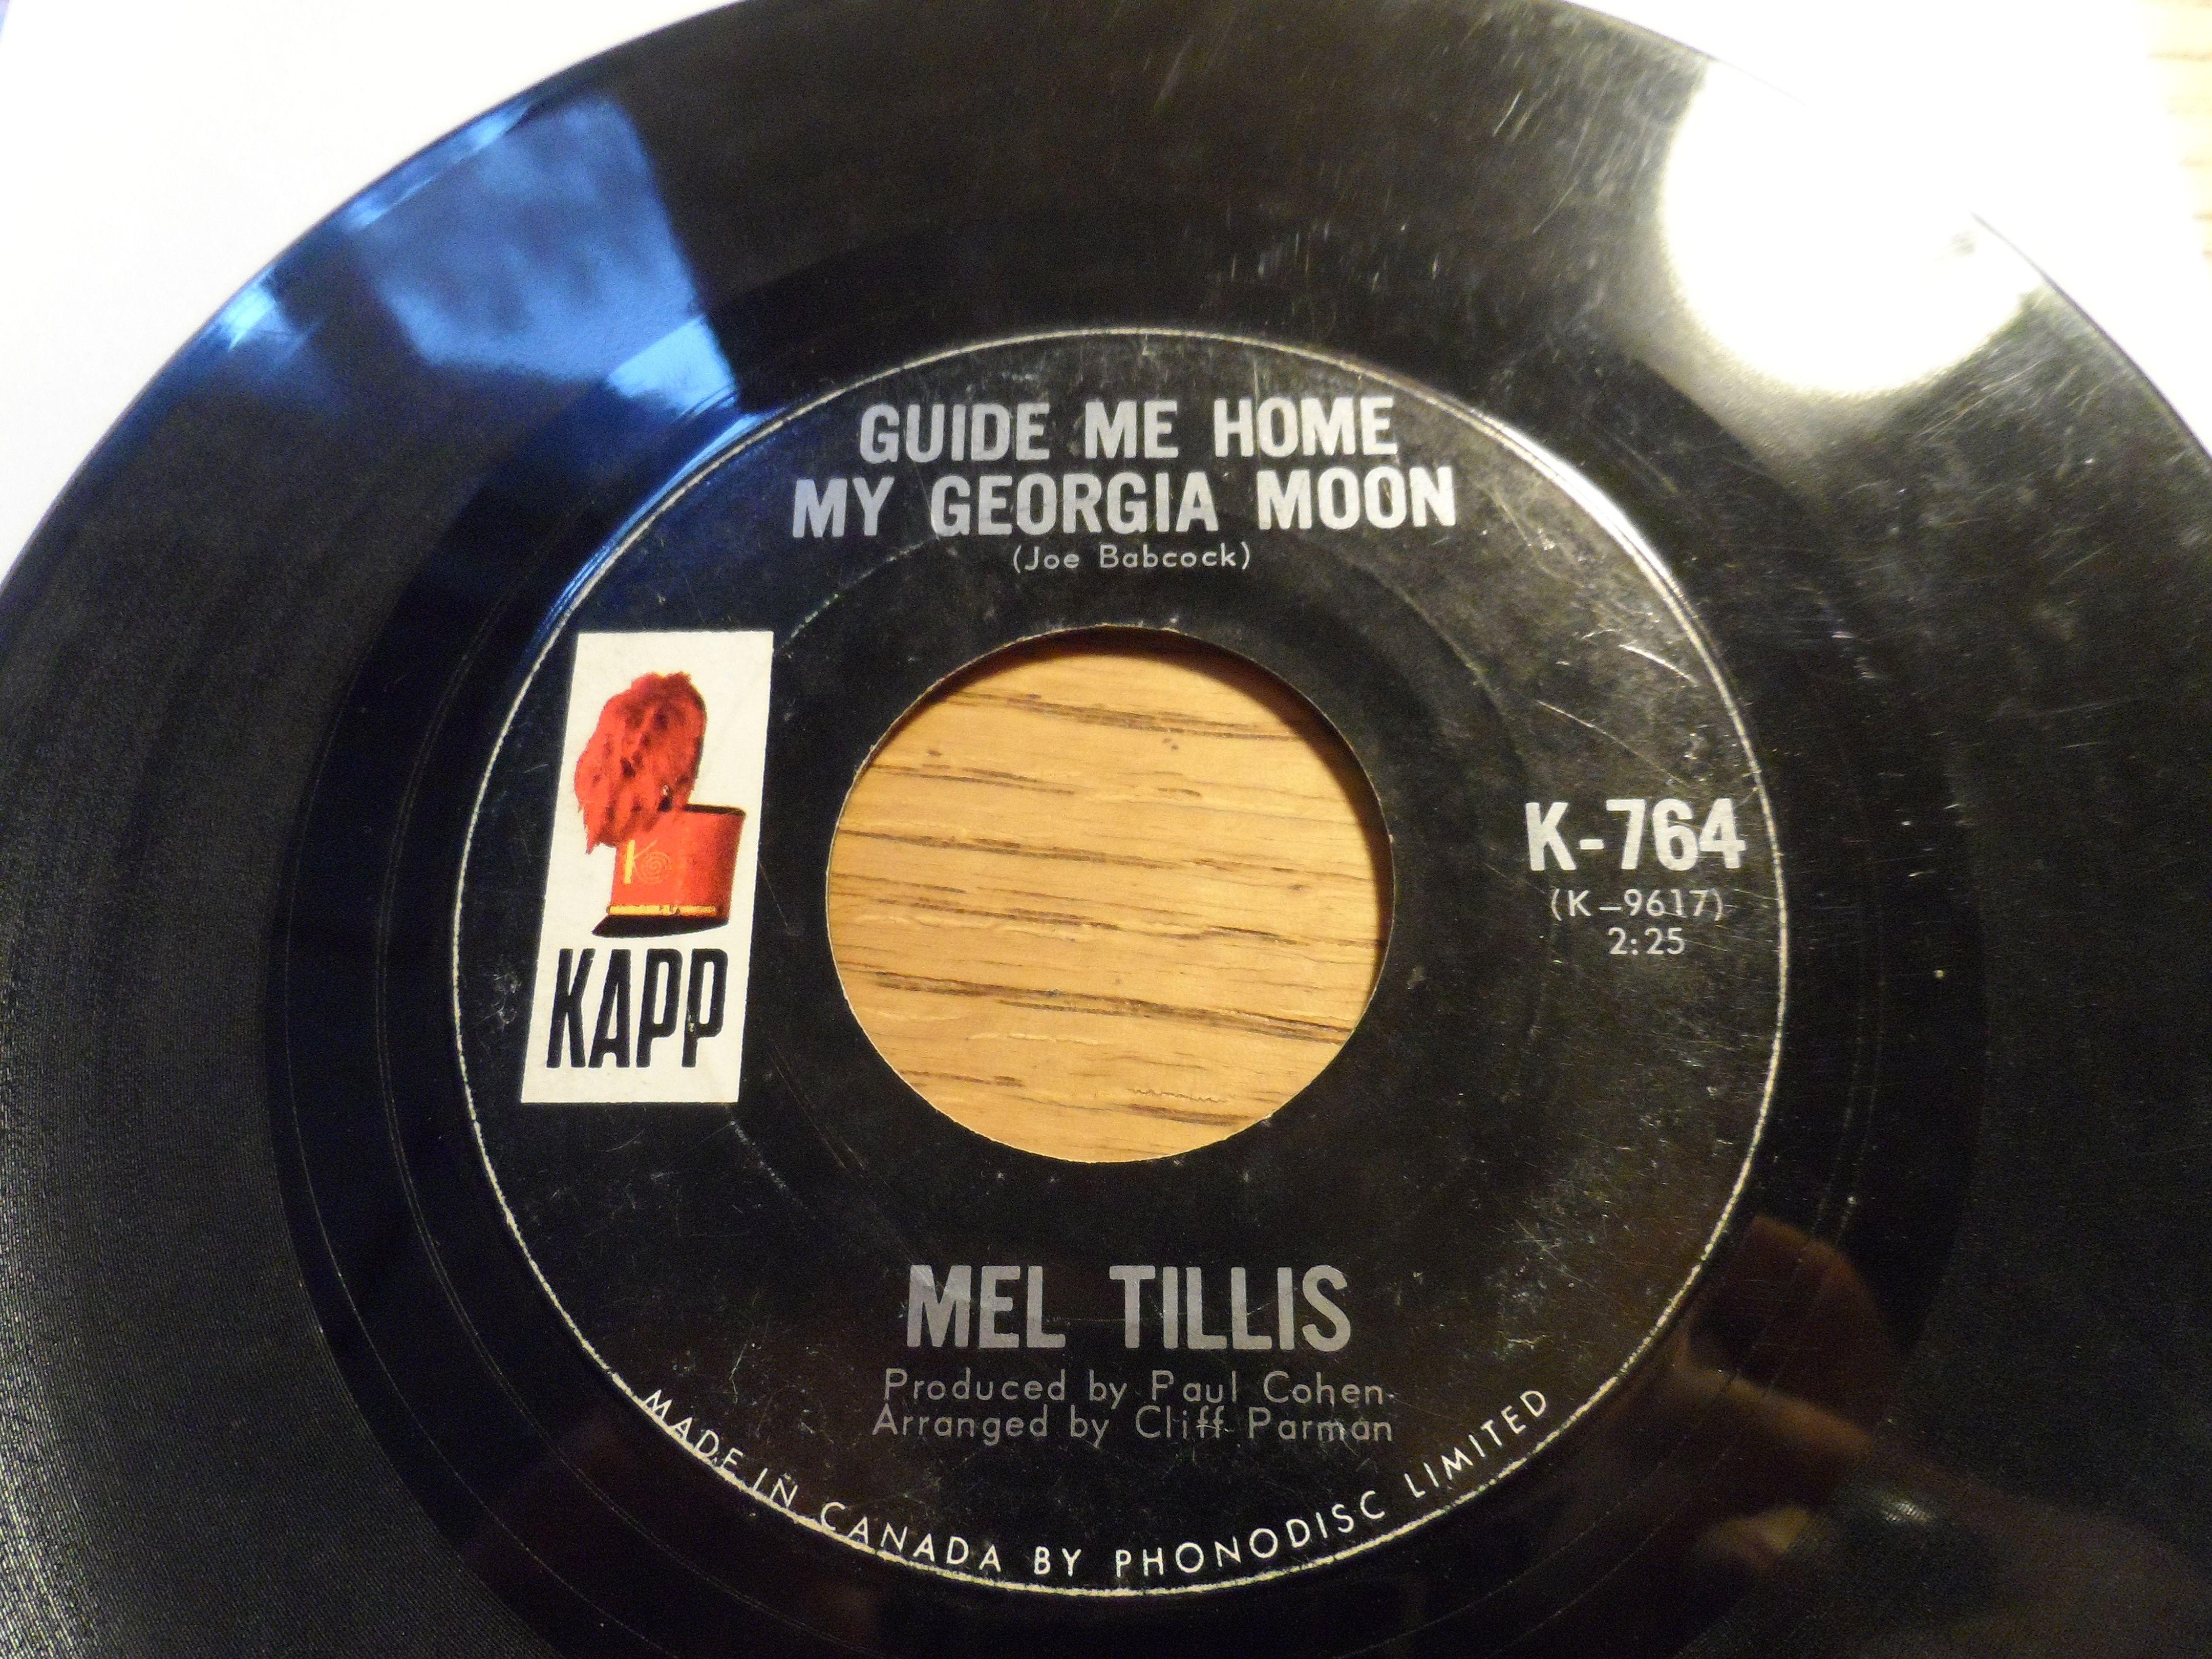 Mel Tillis Mental Revenge Label Kapp Records K 764 Format Vinyl 7 45 Rpm Single Country Canada Revenge Music Record Records